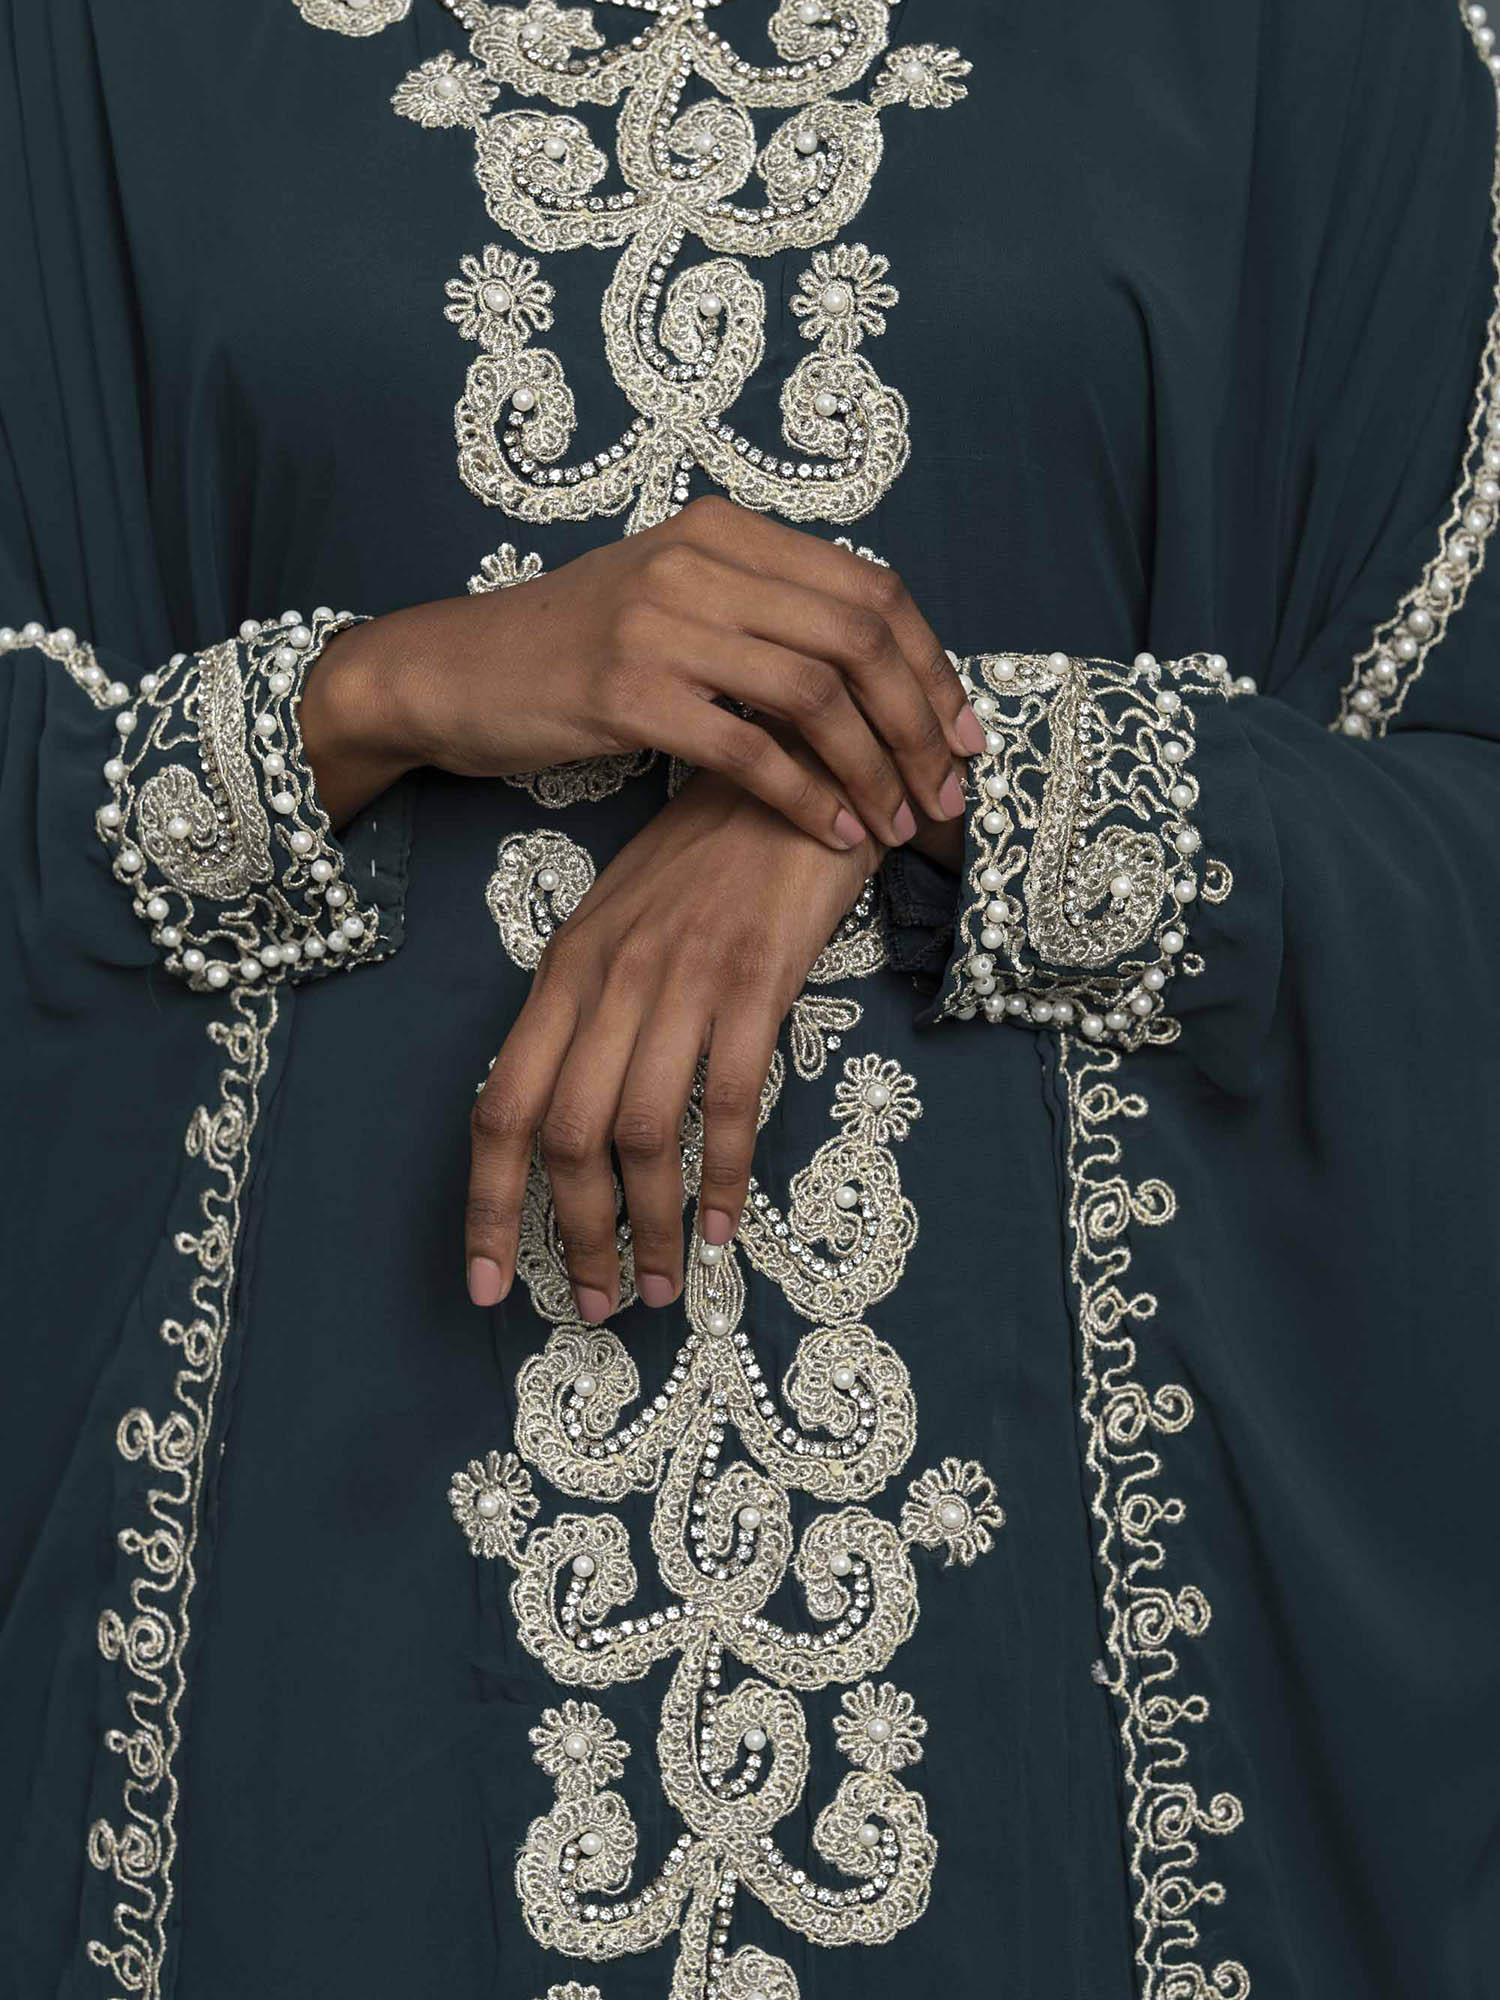 Fashion Photography Maghrebi Clothing Singapore Product Photographer COCO Creative Studio 5